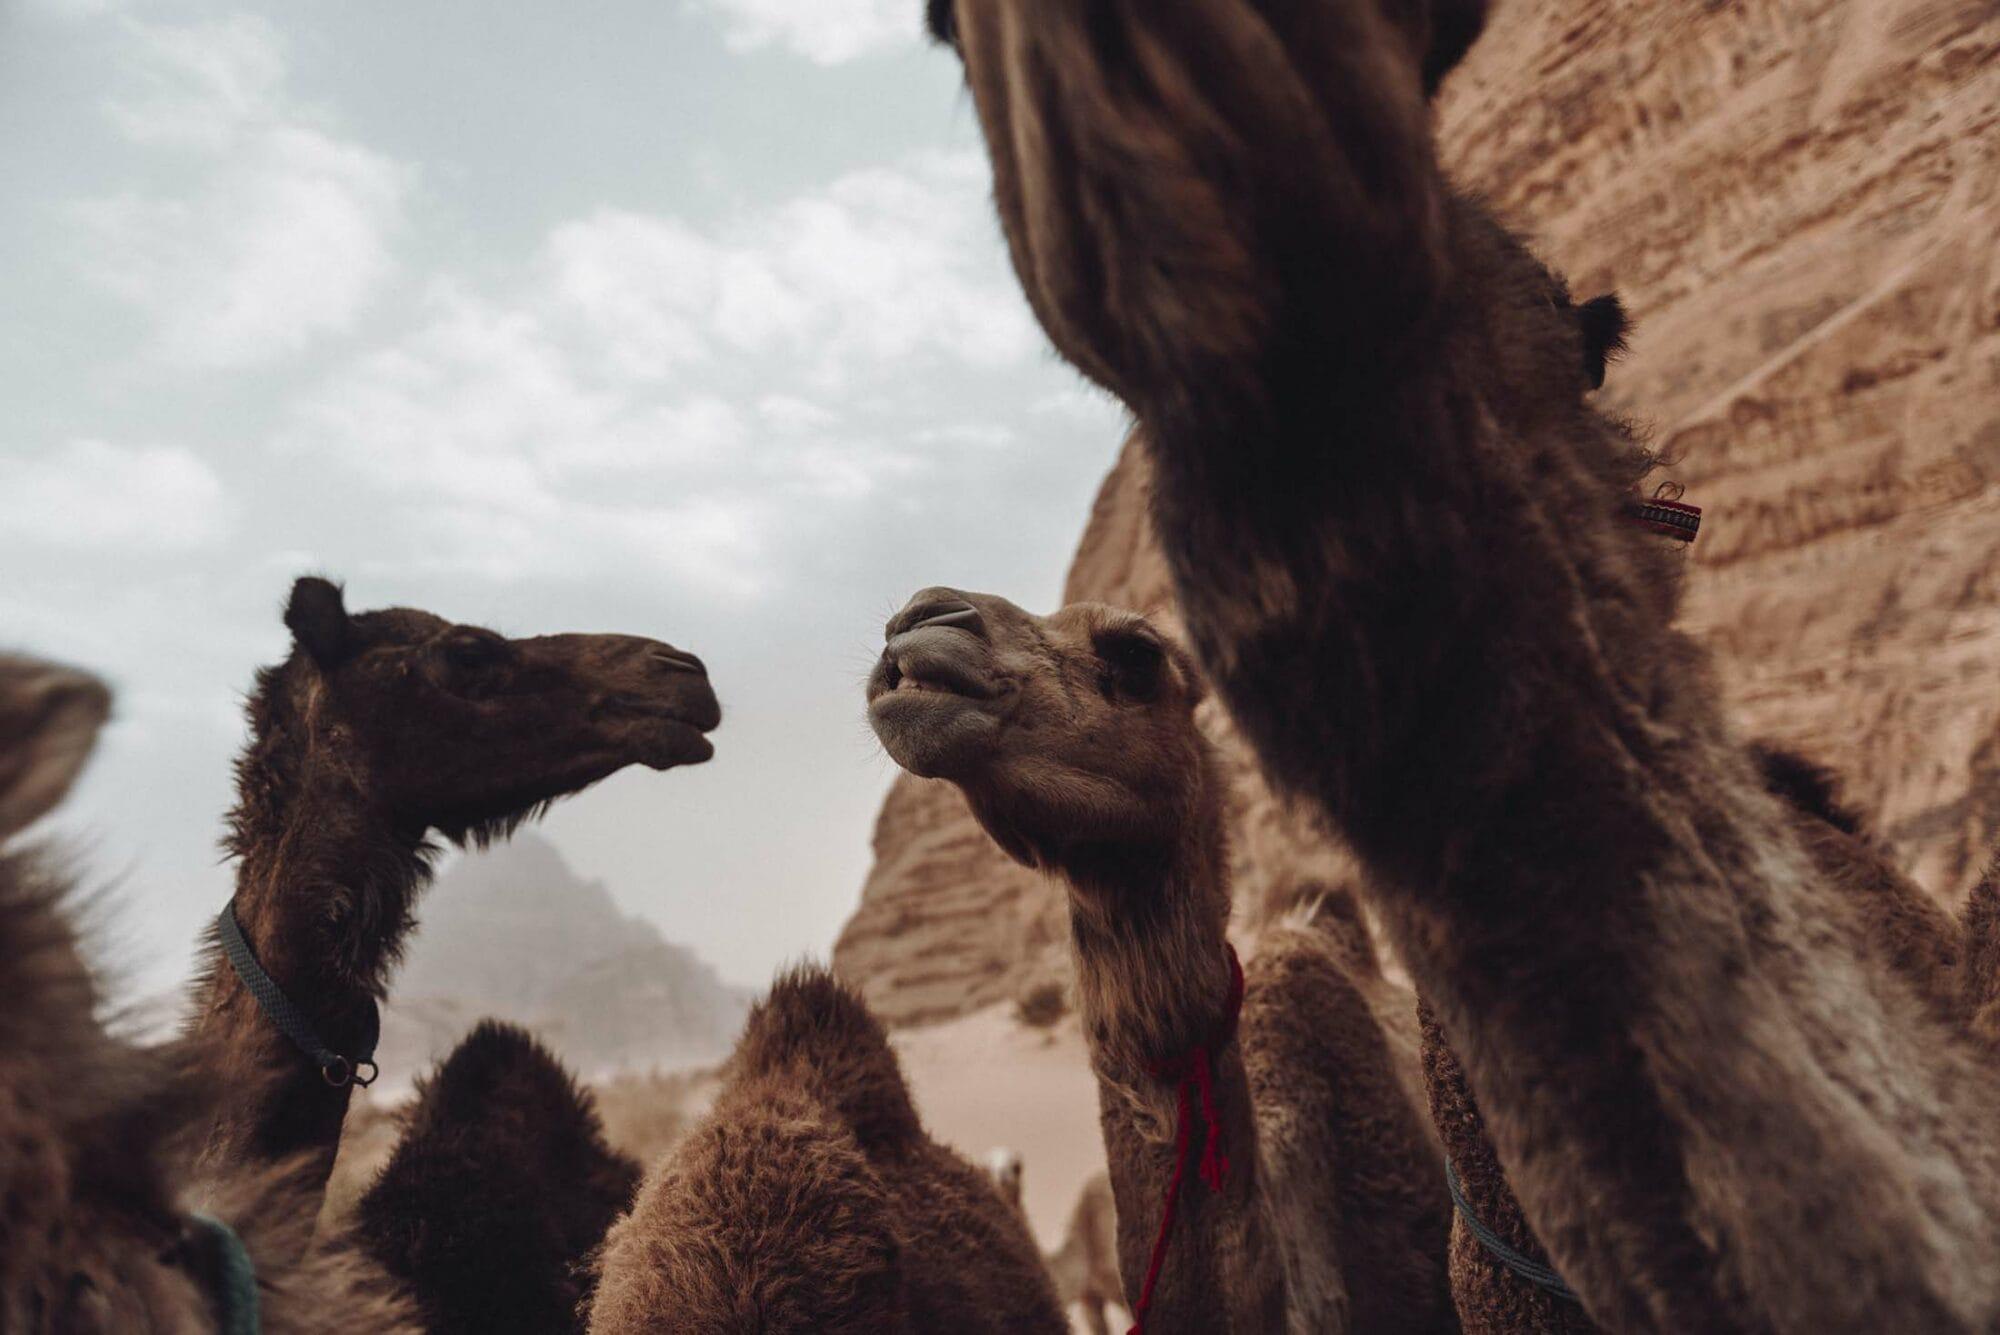 Fotoreis naar Jordanie | ROCKY ROADS TRAVEL